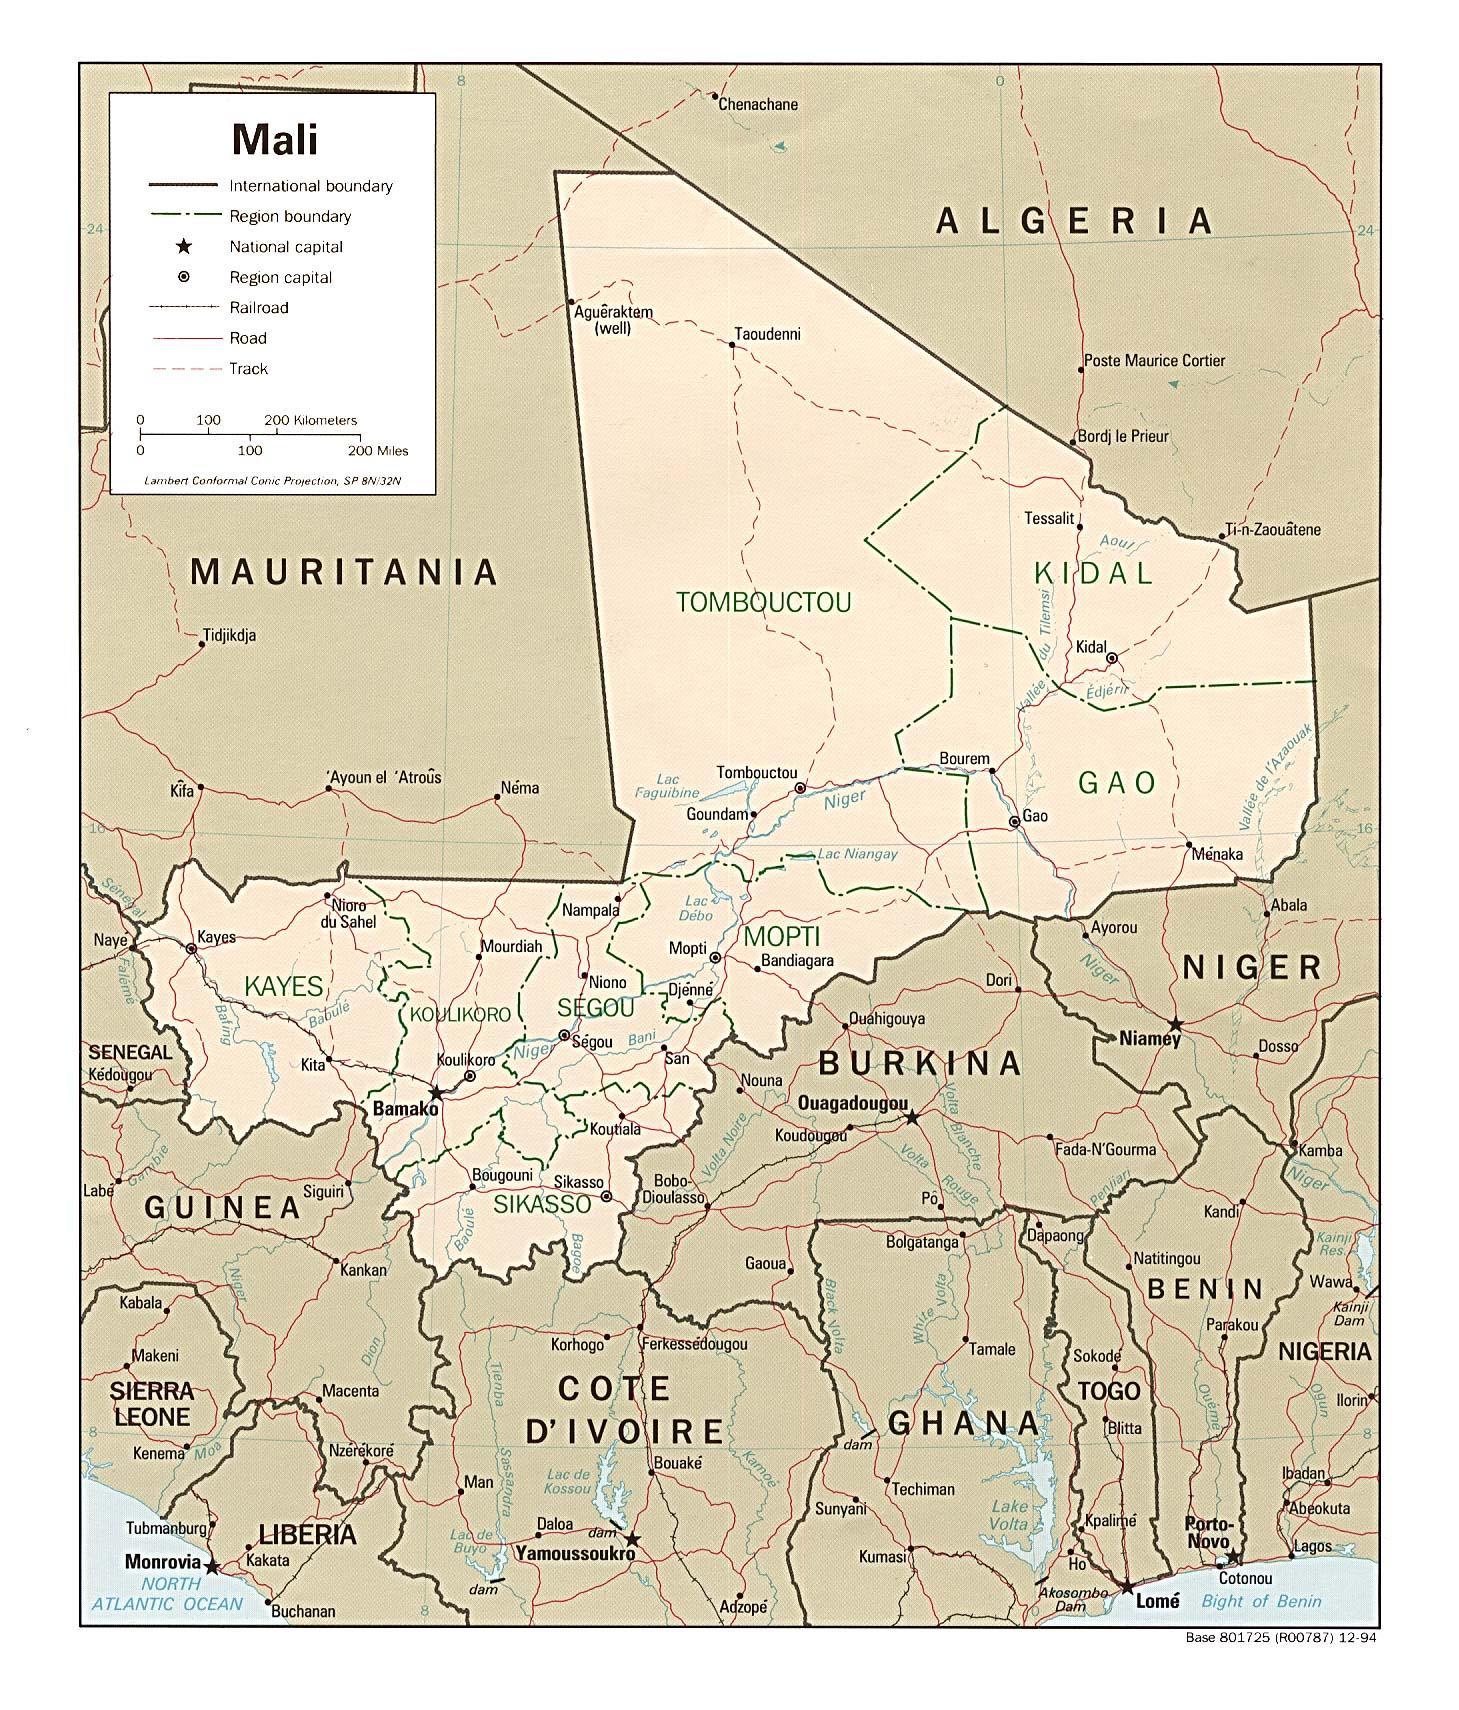 Mali Land Karta Karta Over Mali Land Vastra Afrika Afrika